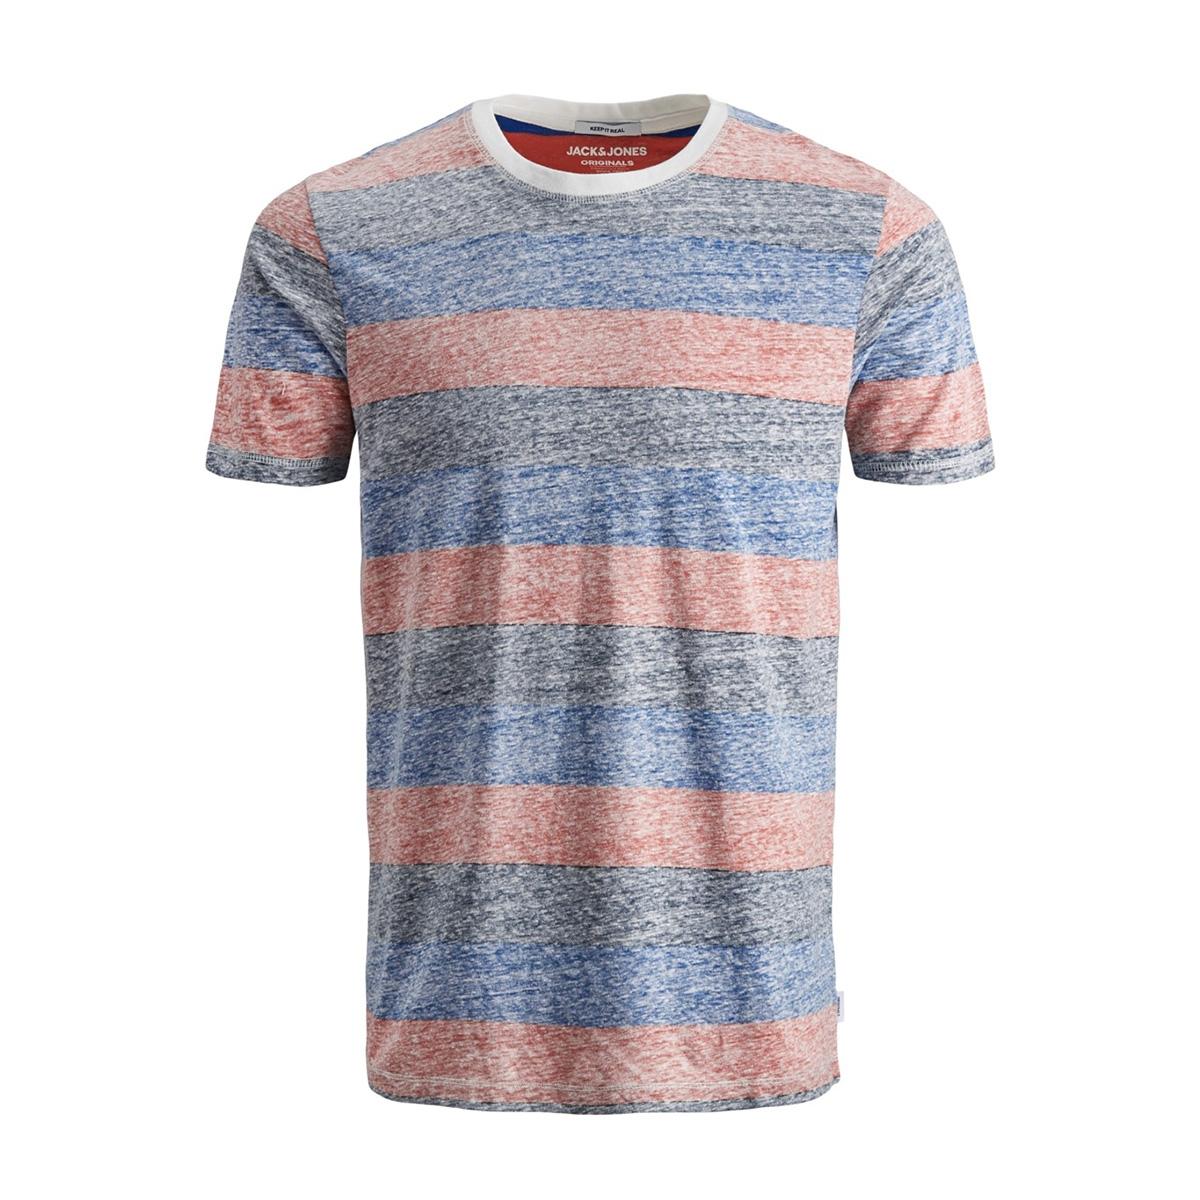 jorsider tee ss crew neck 12152722 jack & jones t-shirt fiery red/slim